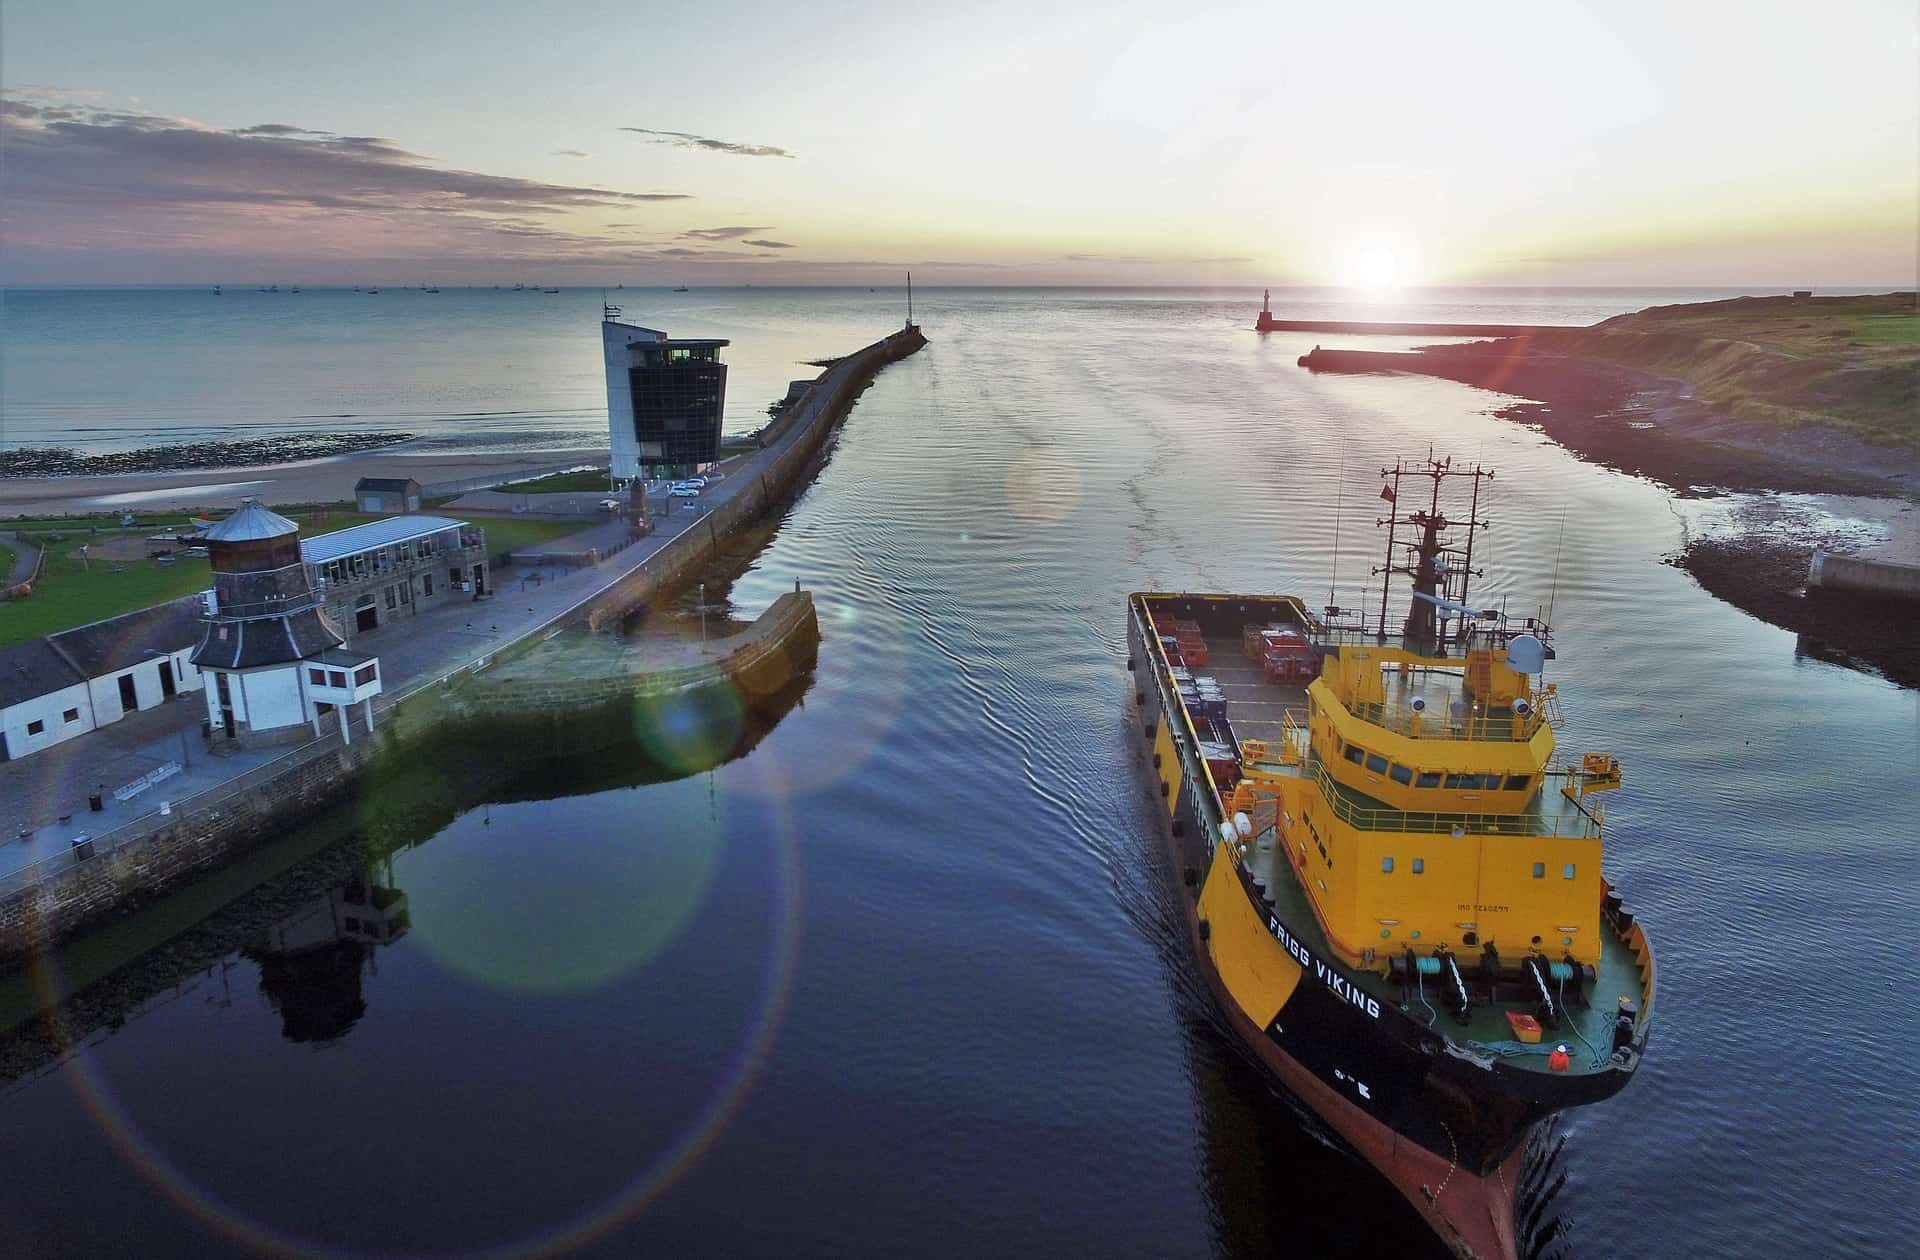 Aberdeen's harbour